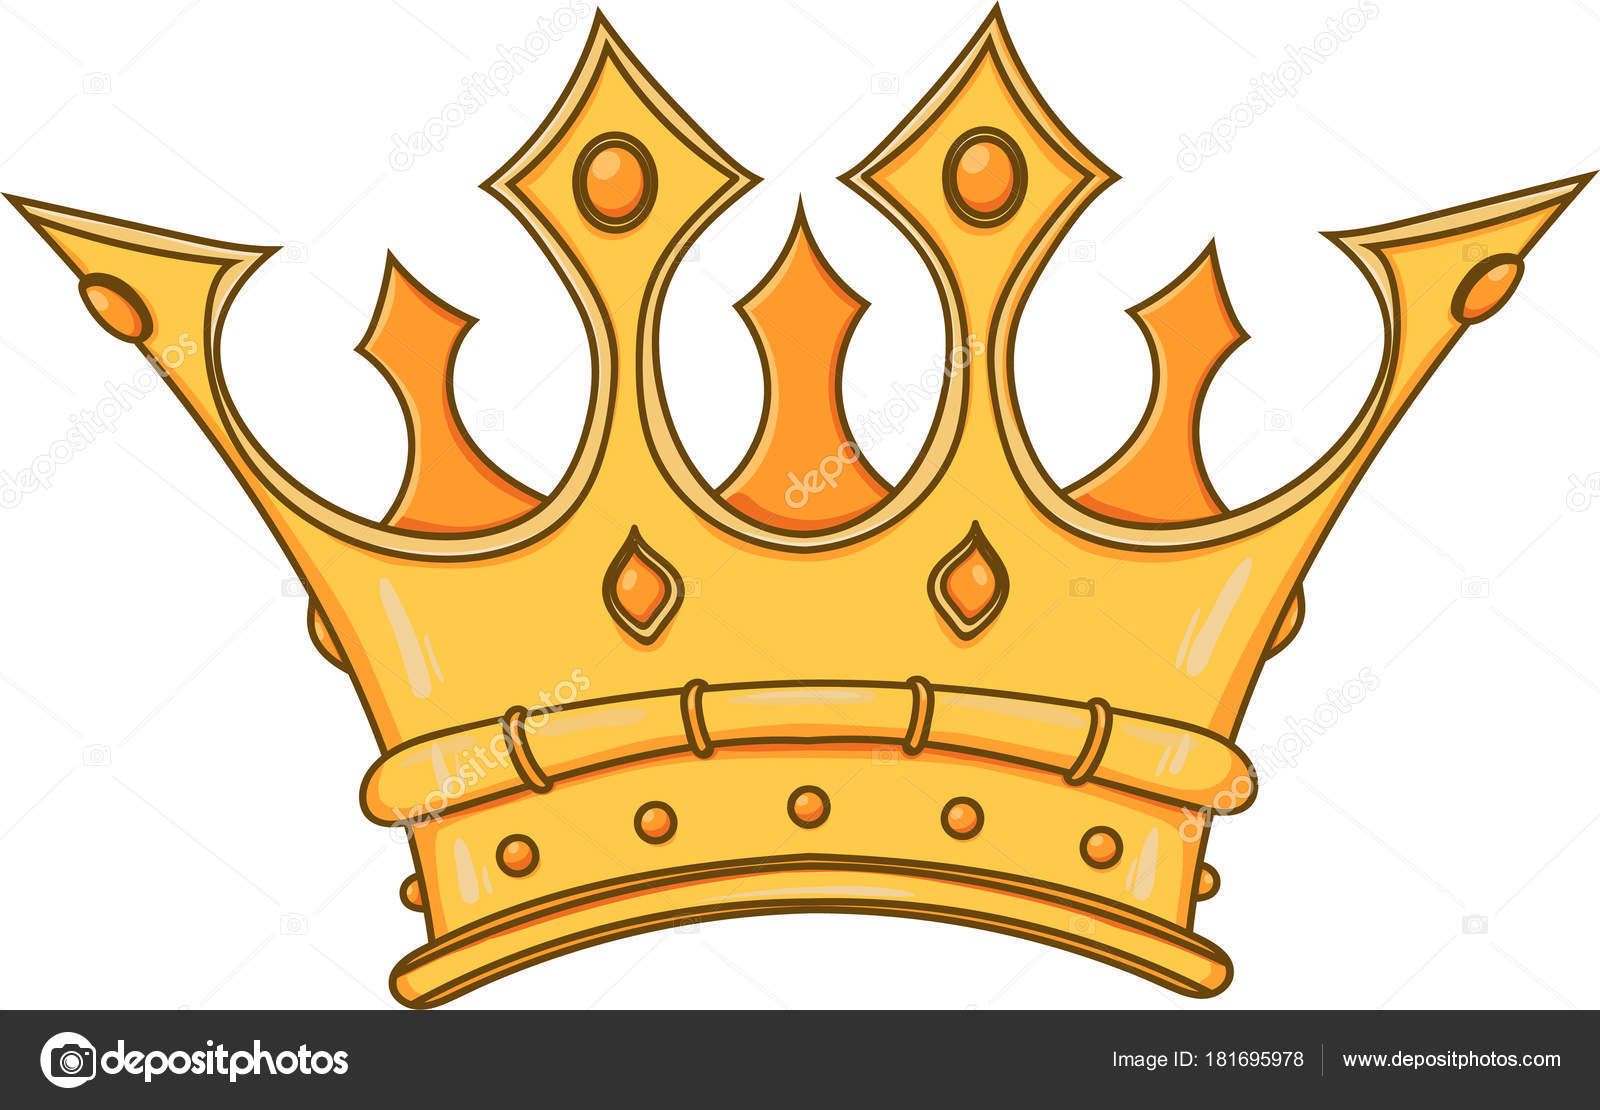 Golden King Crown Hand Drawn Vector Stock Illustration